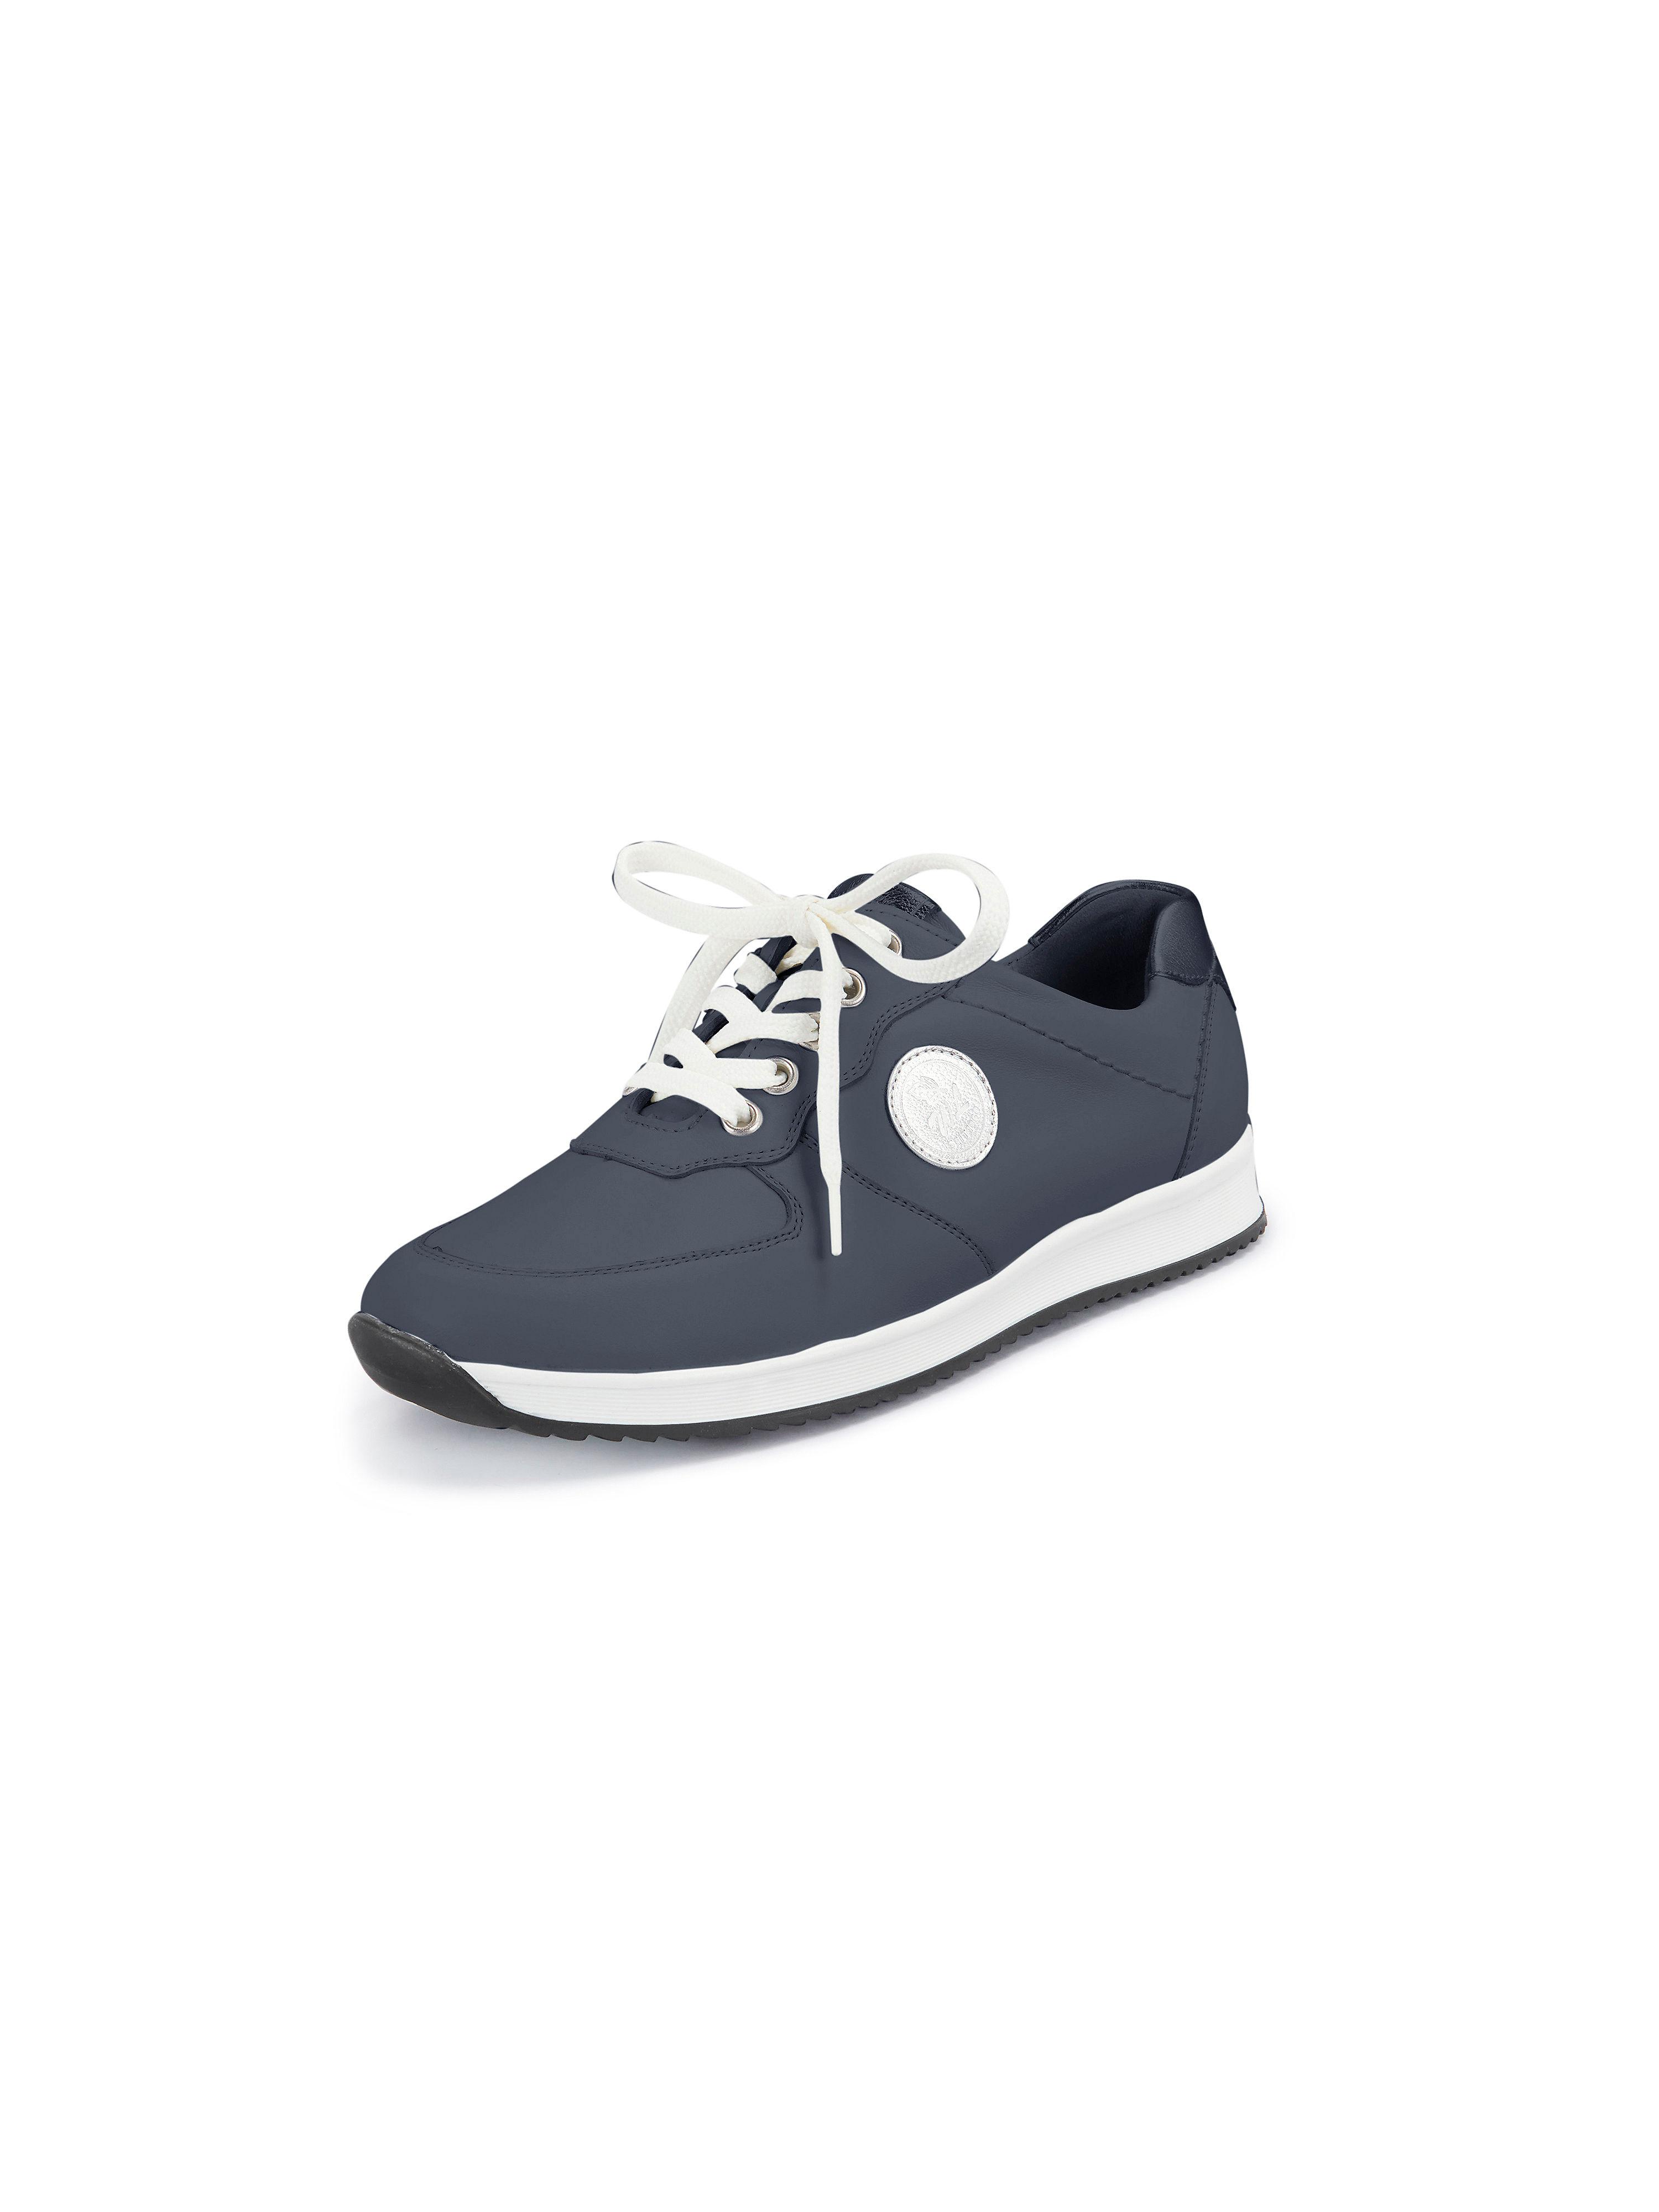 Les sneakers Hayden Waldläufer bleu taille 42